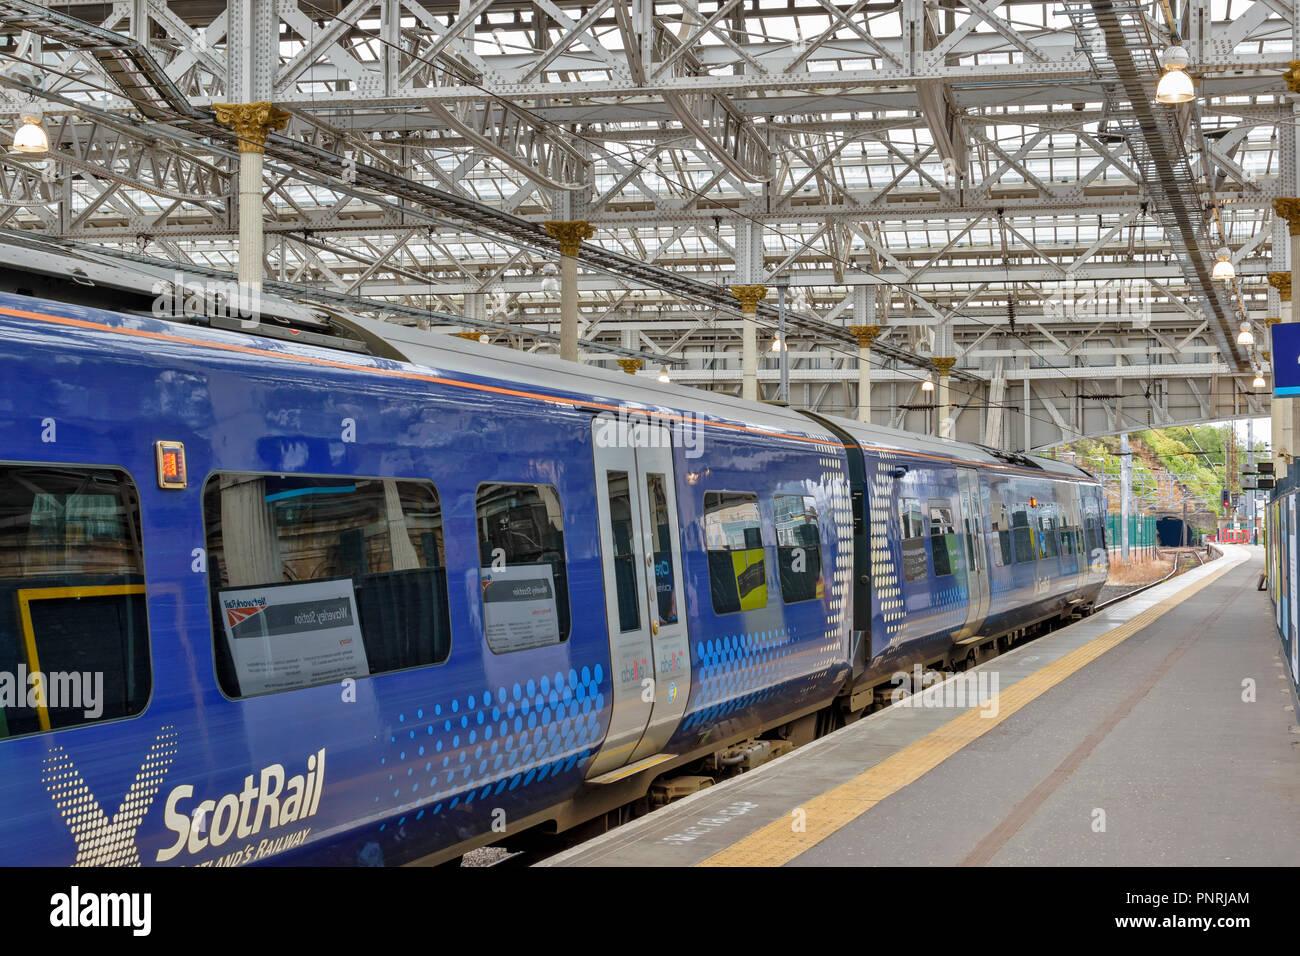 EDINBURGH SCOTLAND WAVERLEY STATION BLUE CARRIAGES OF SCOT RAIL TRAIN WAITING AT PLATFORM - Stock Image